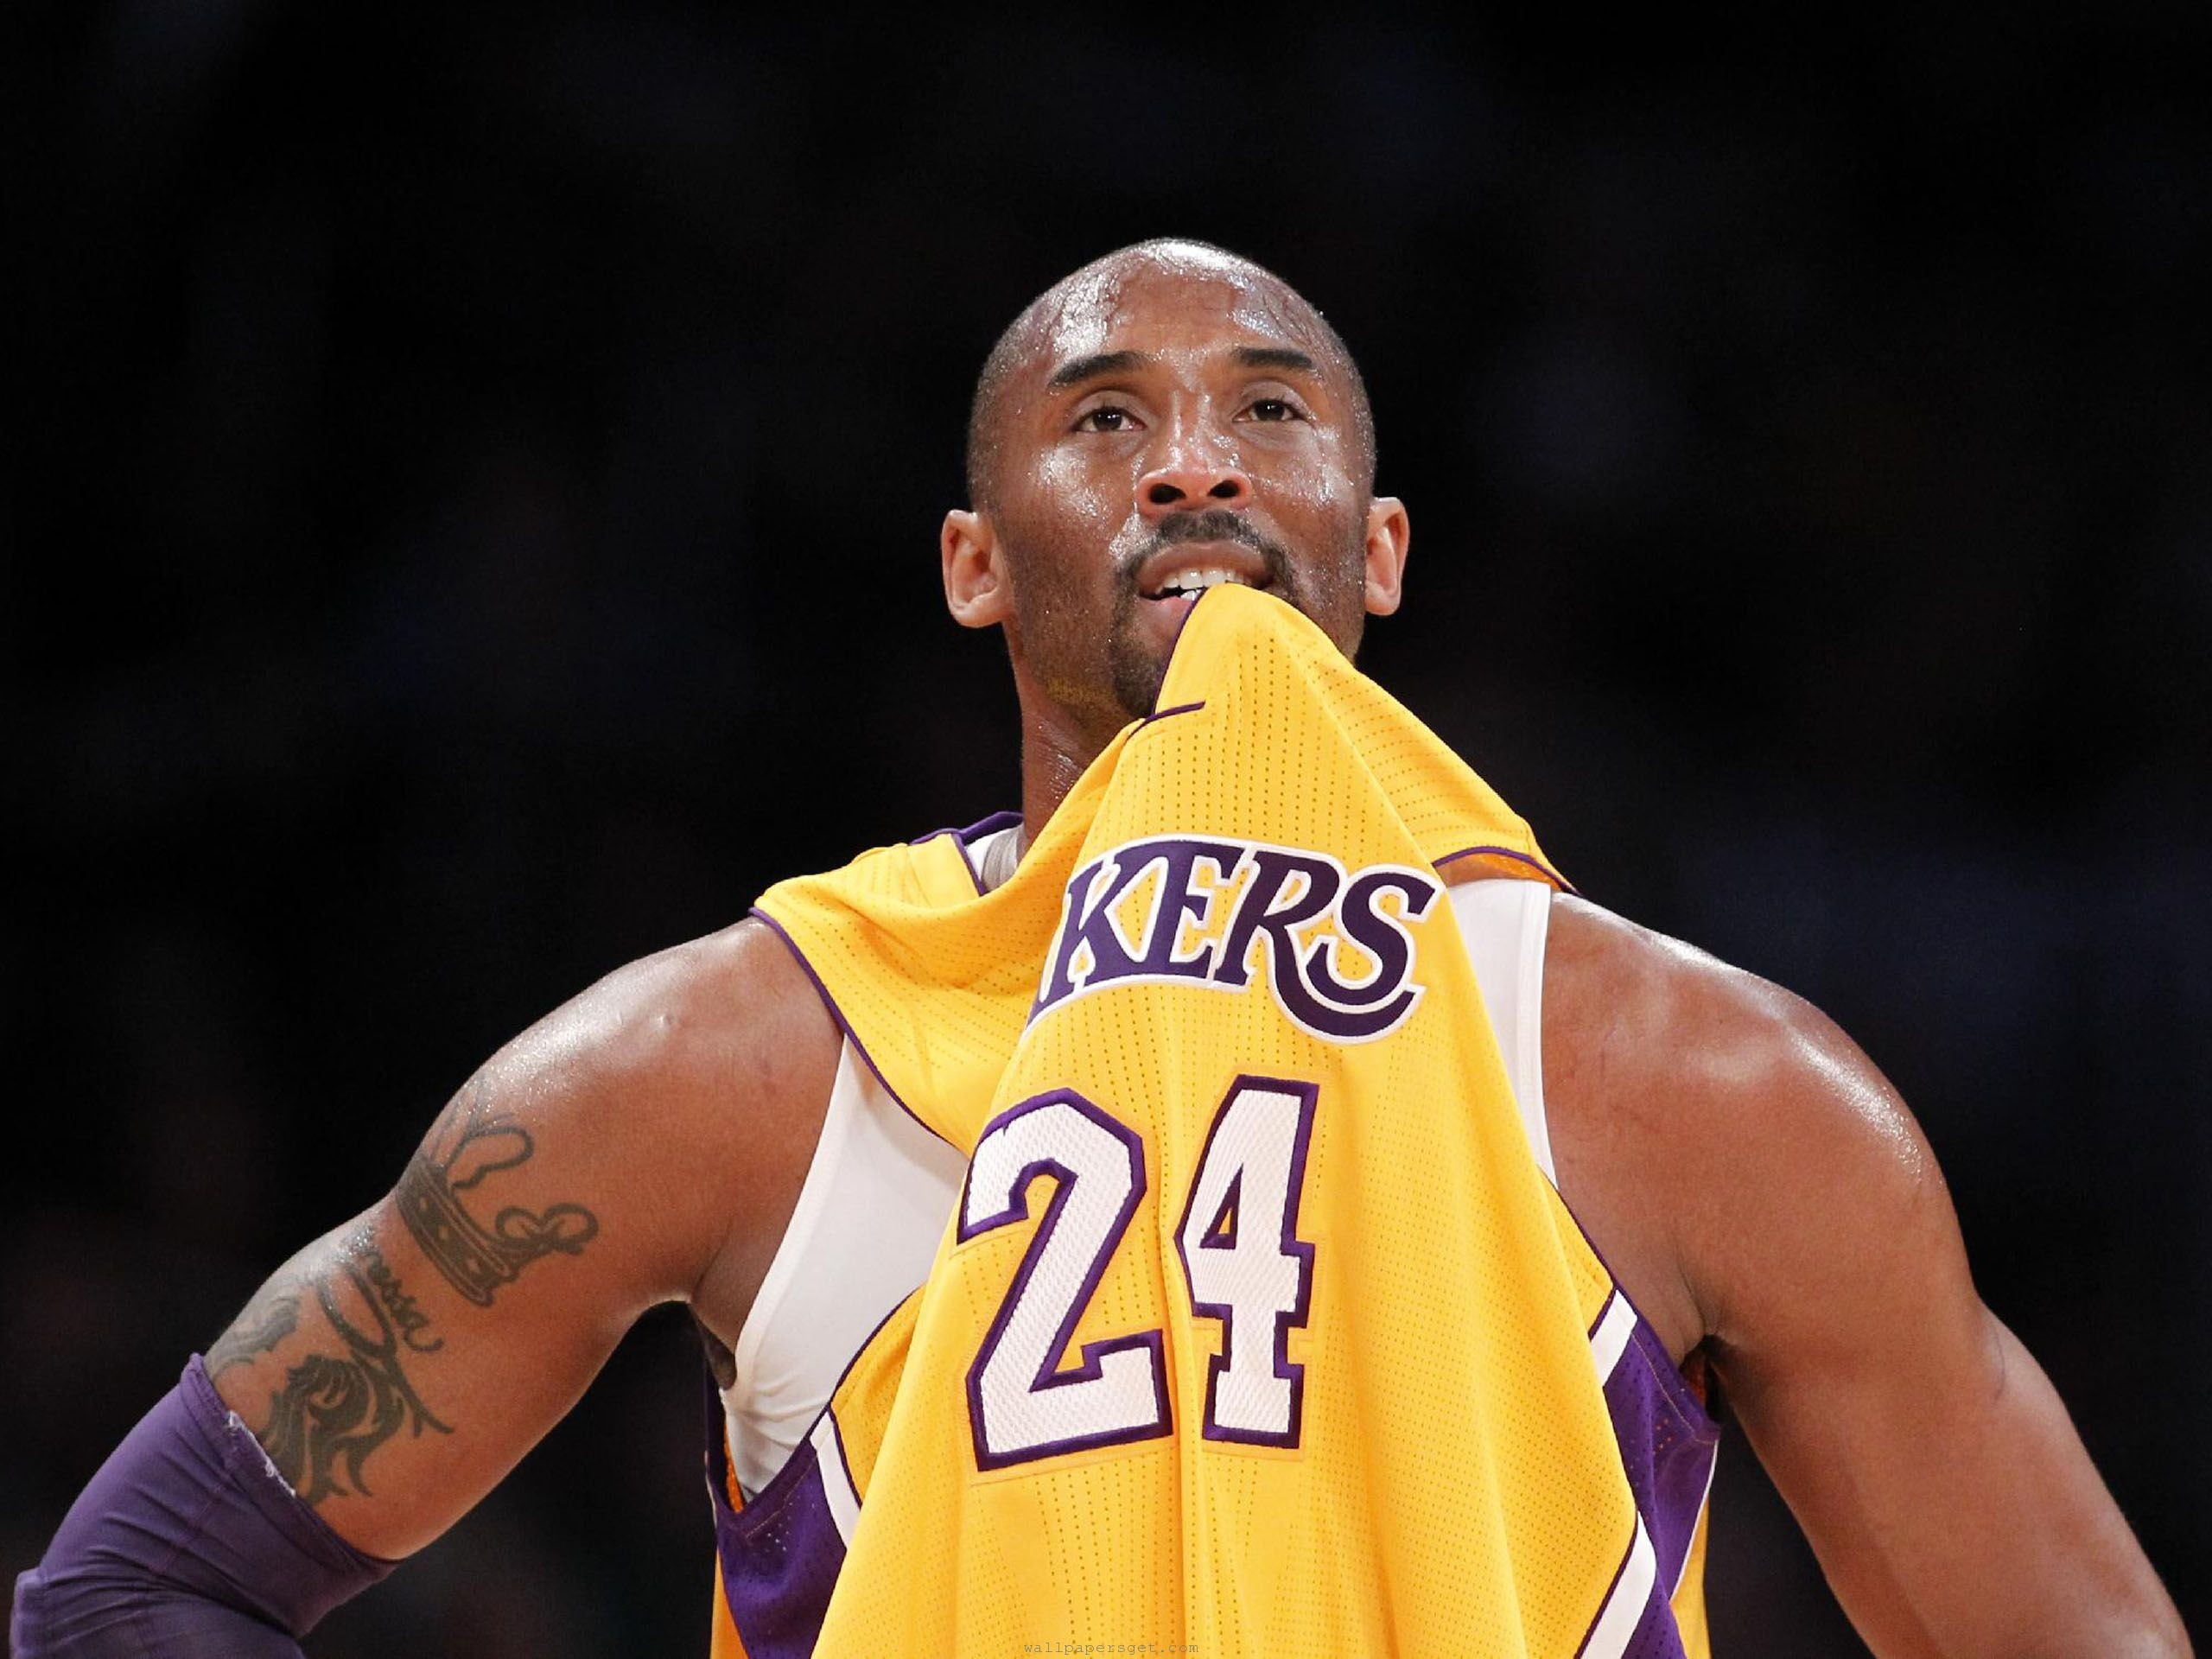 Images Of Kobe Bryant